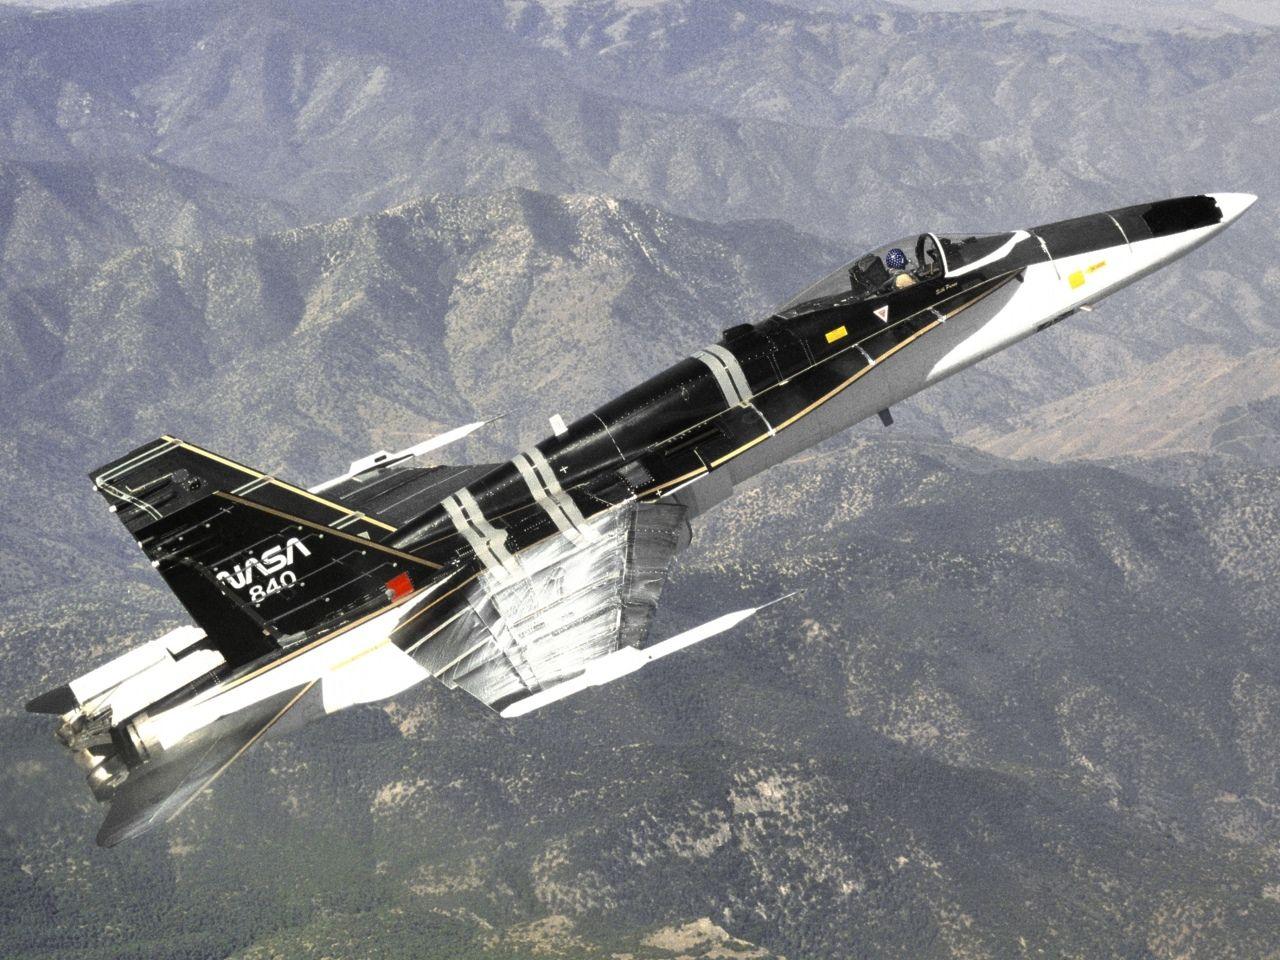 Nasa's Hornet | Toys for boys | Pinterest | Aircraft ...